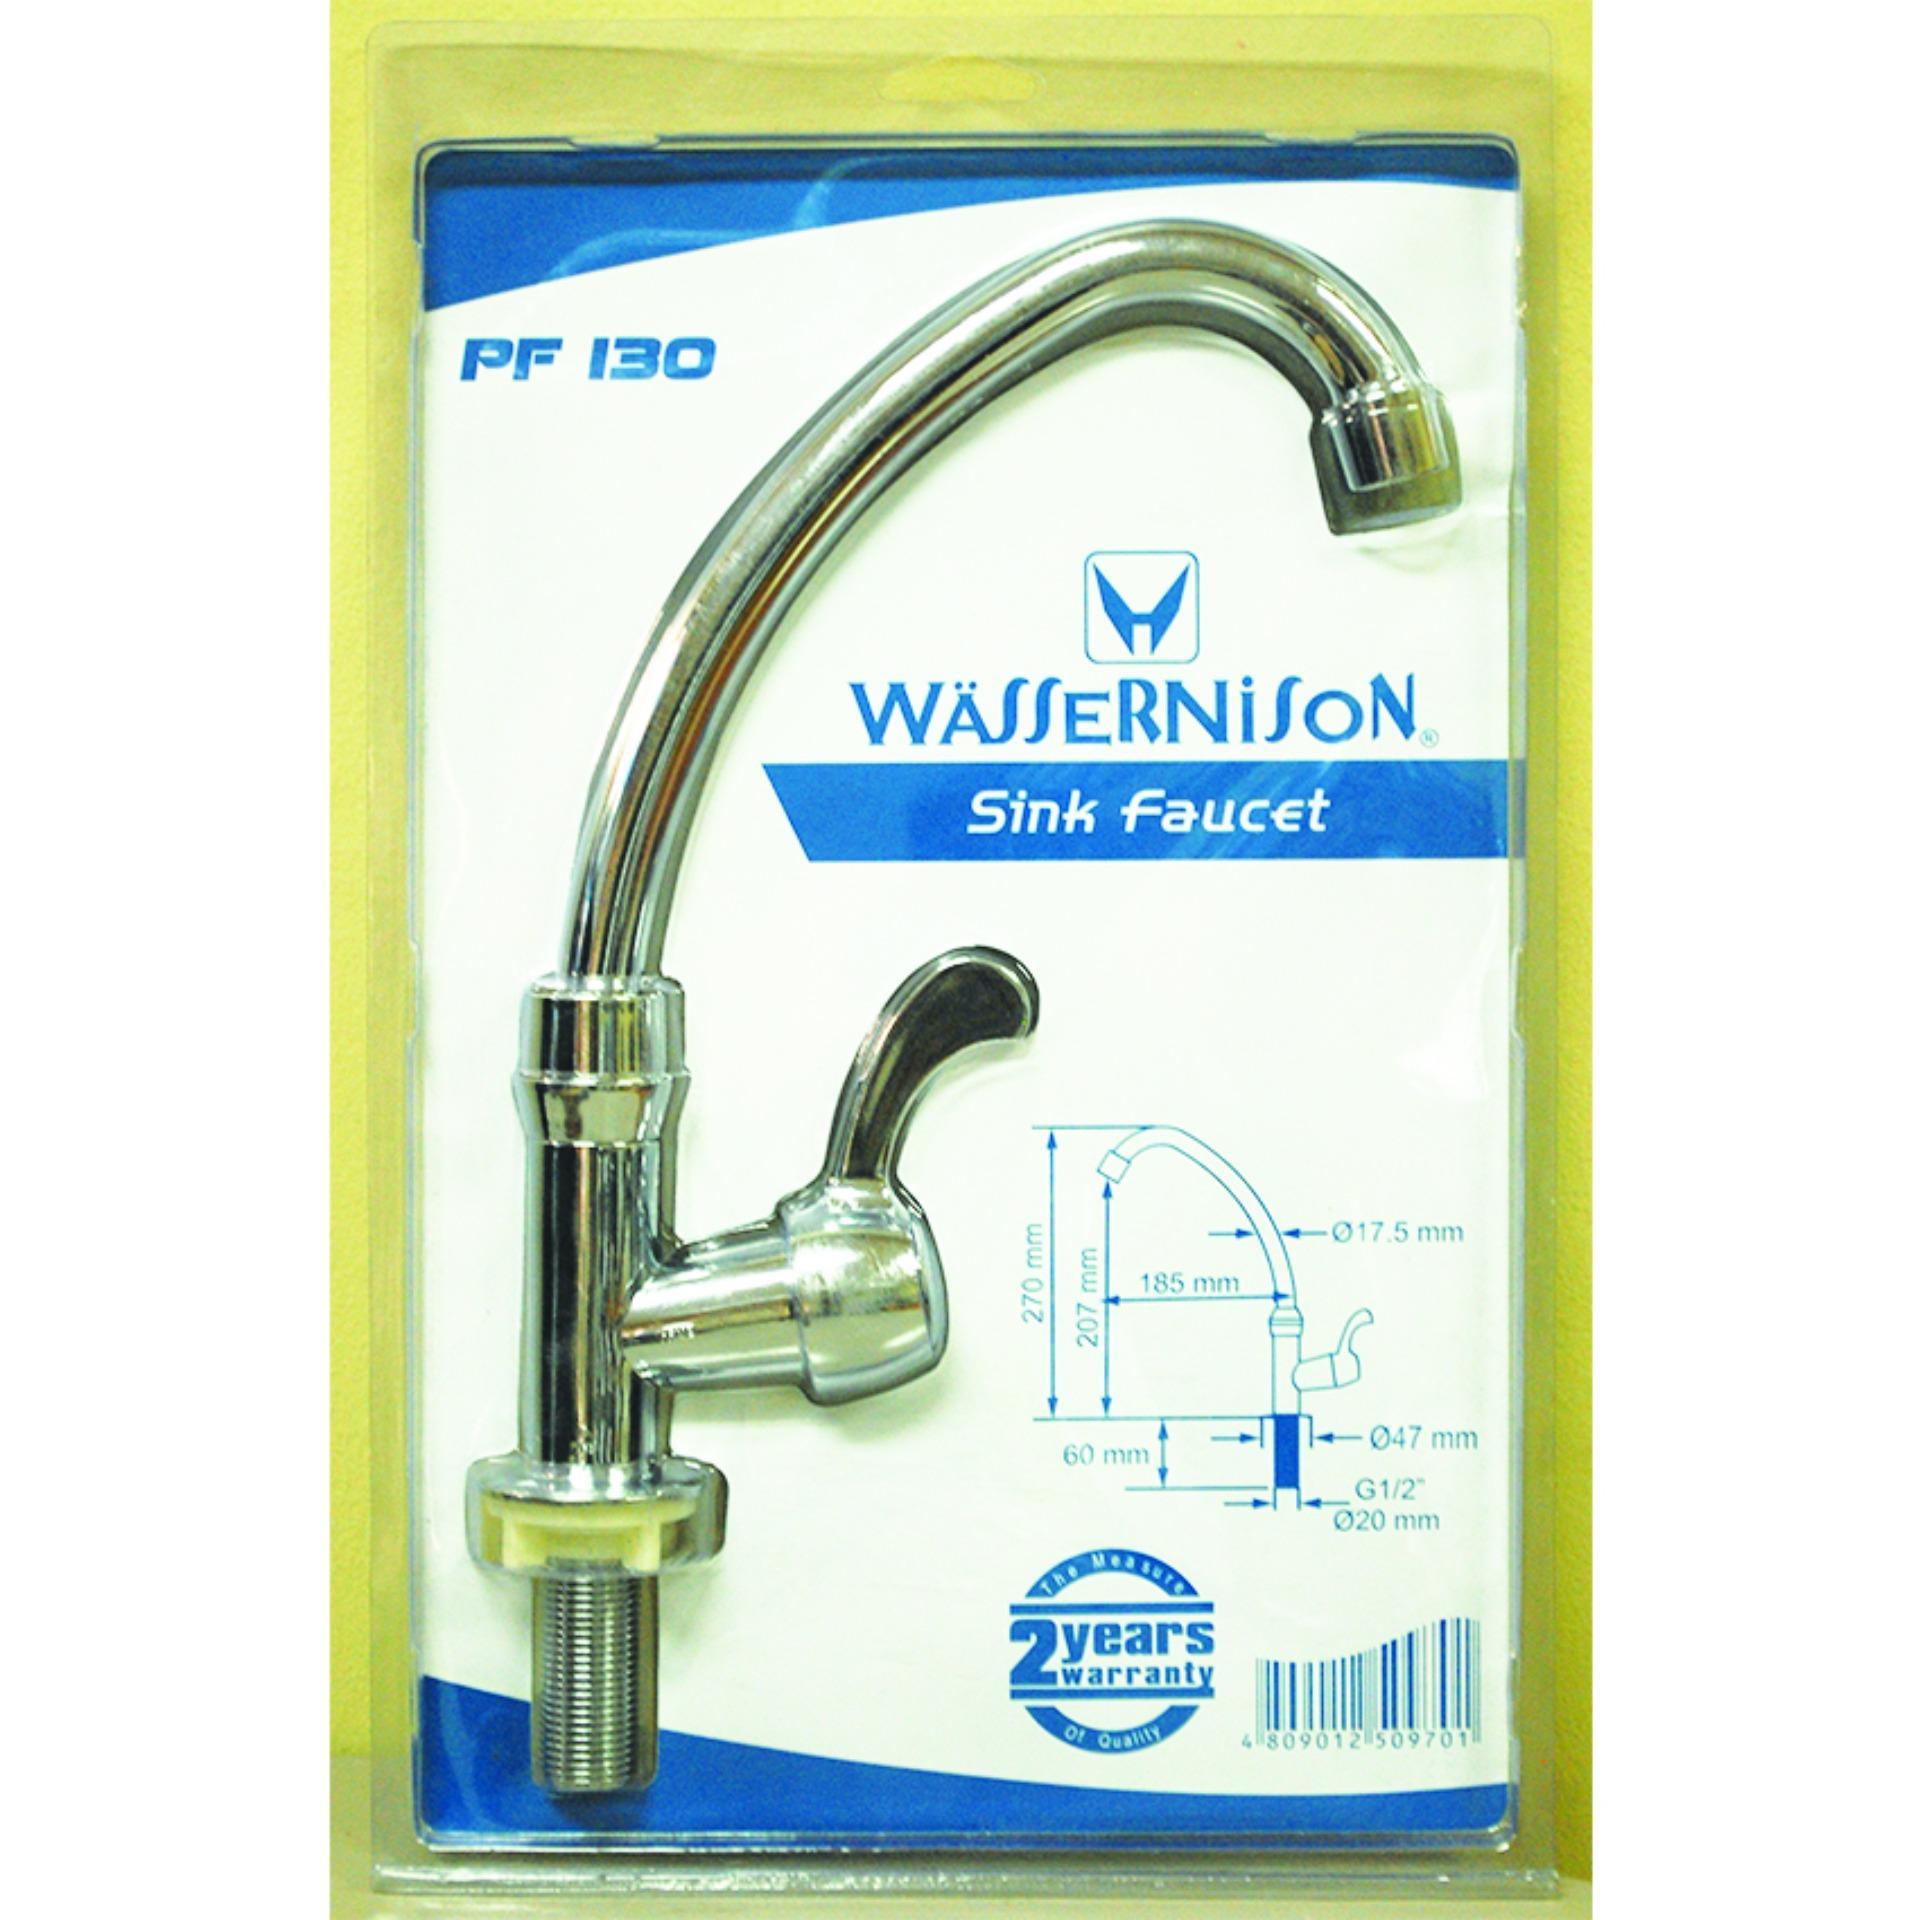 Philippines | Wassernison Plastic Sink Faucet PF 130 Price Comparison